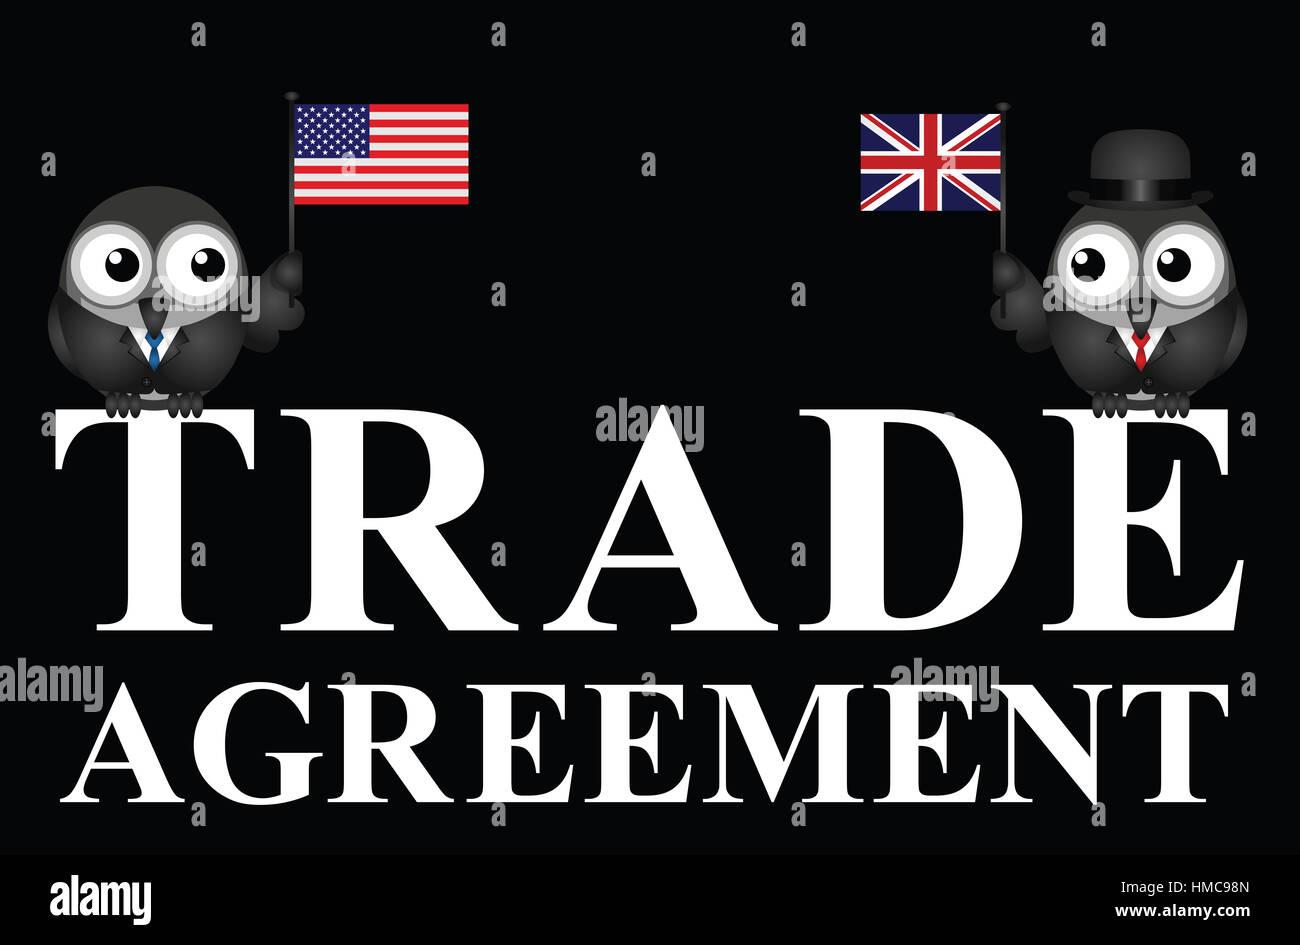 Representation Of Usa Uk Transatlantic Trade Agreement Negotiations